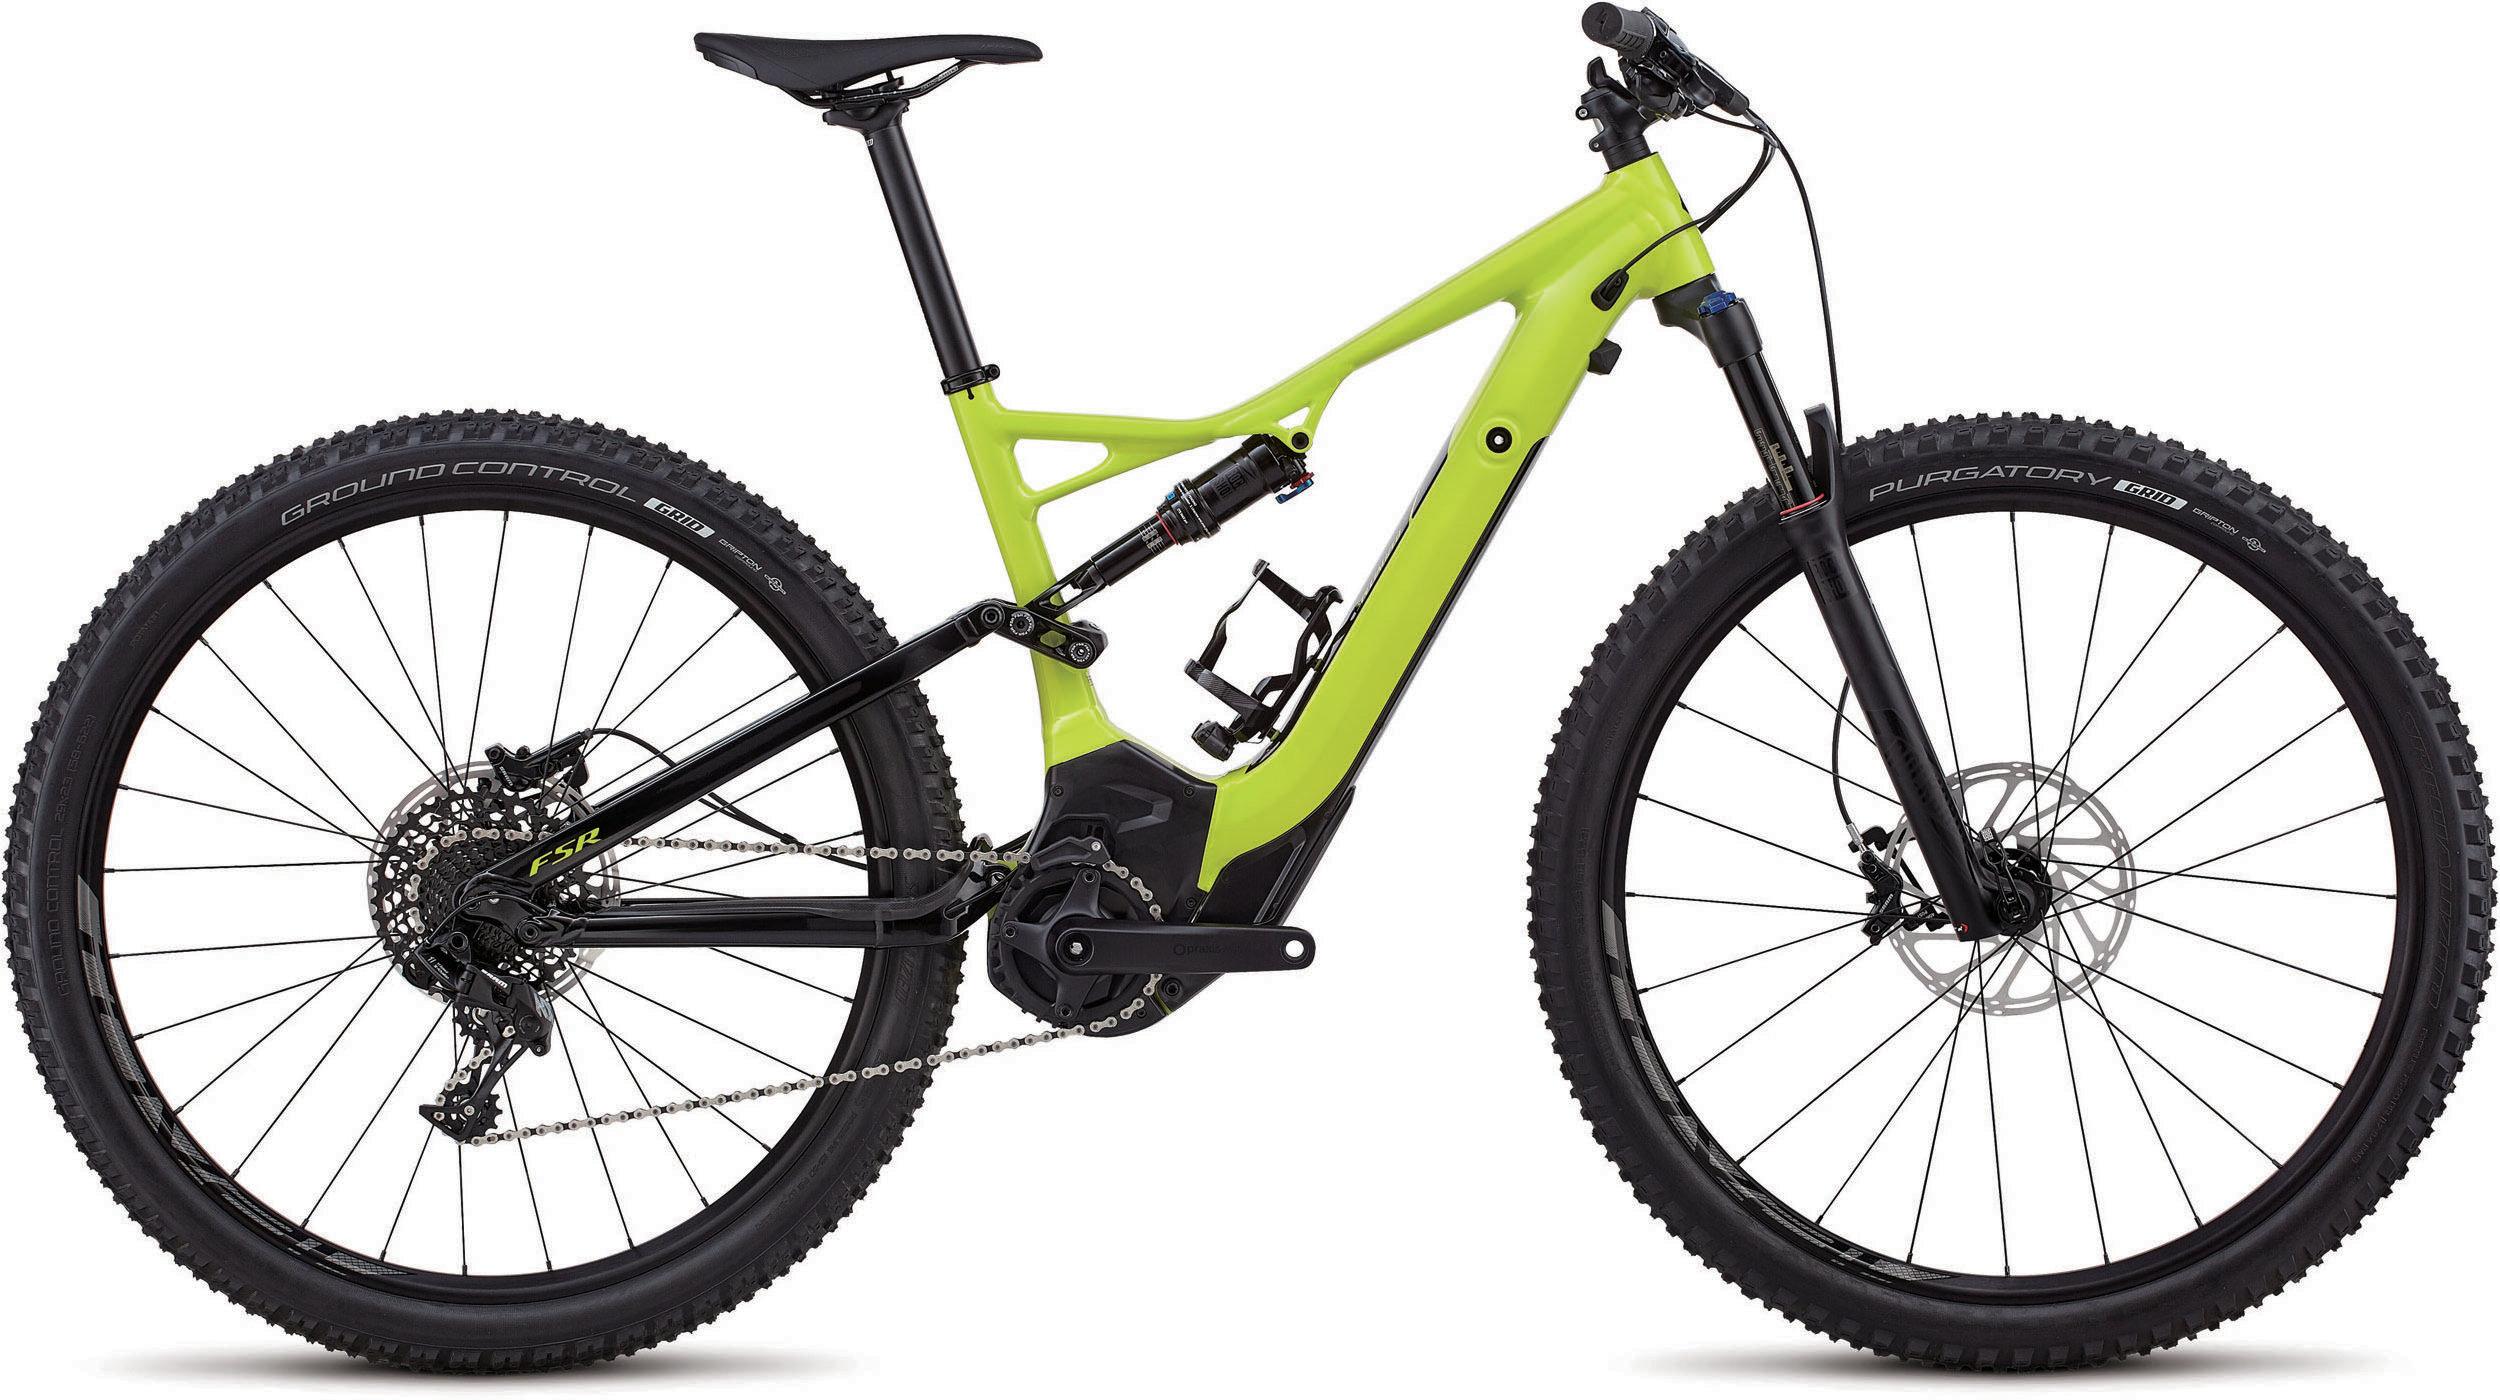 Specialized Men´s Turbo Levo FSR Short Travel 29 RH L - Fahrrad online kaufen | Online Shop Bike Profis